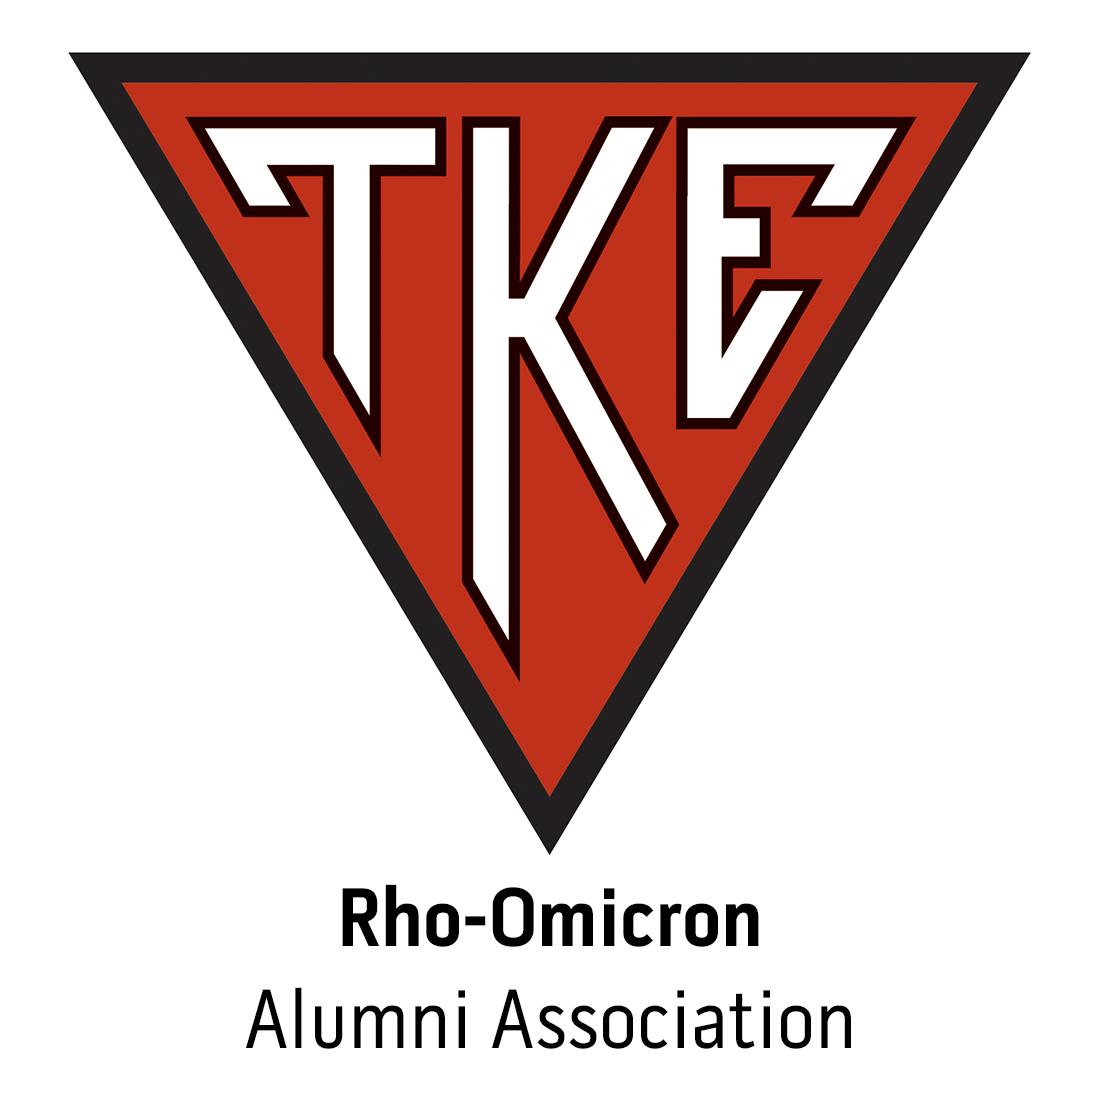 Rho-Omicron Alumni Association at Cal Poly, San Luis Obispo